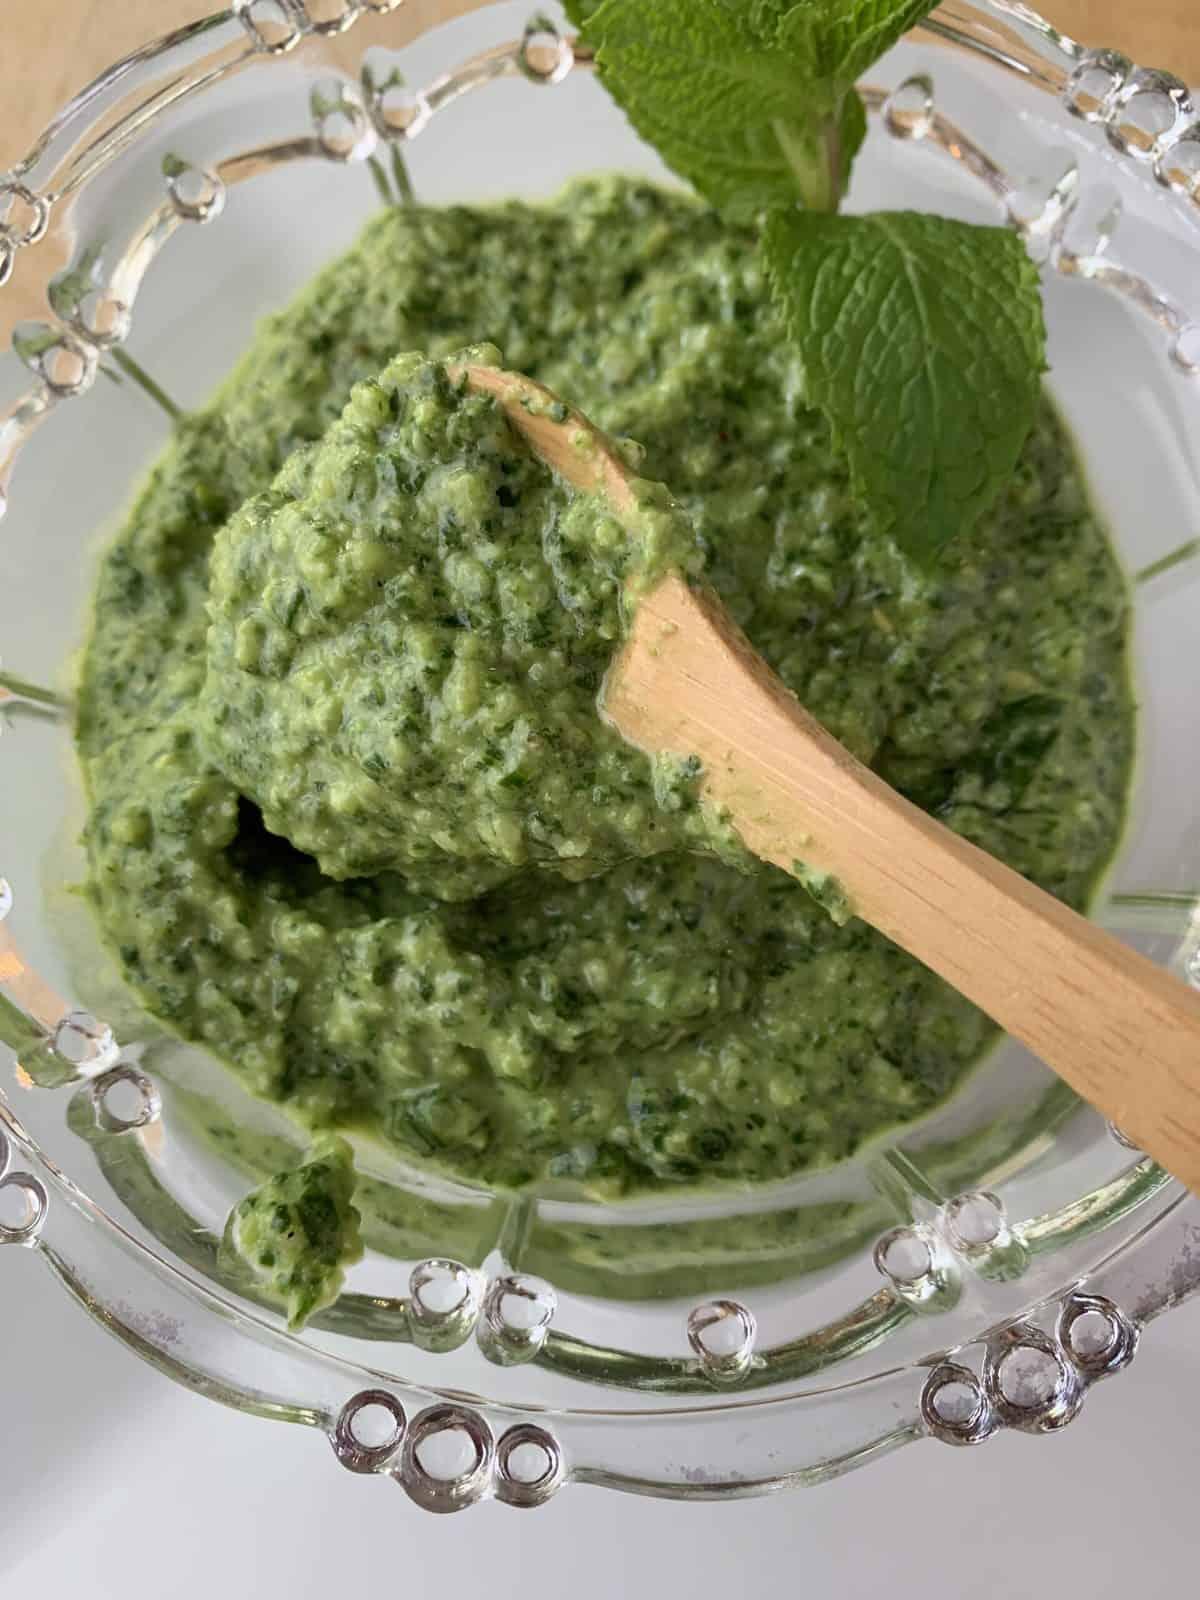 Pesto sauce in spoon over a bowl of pesto